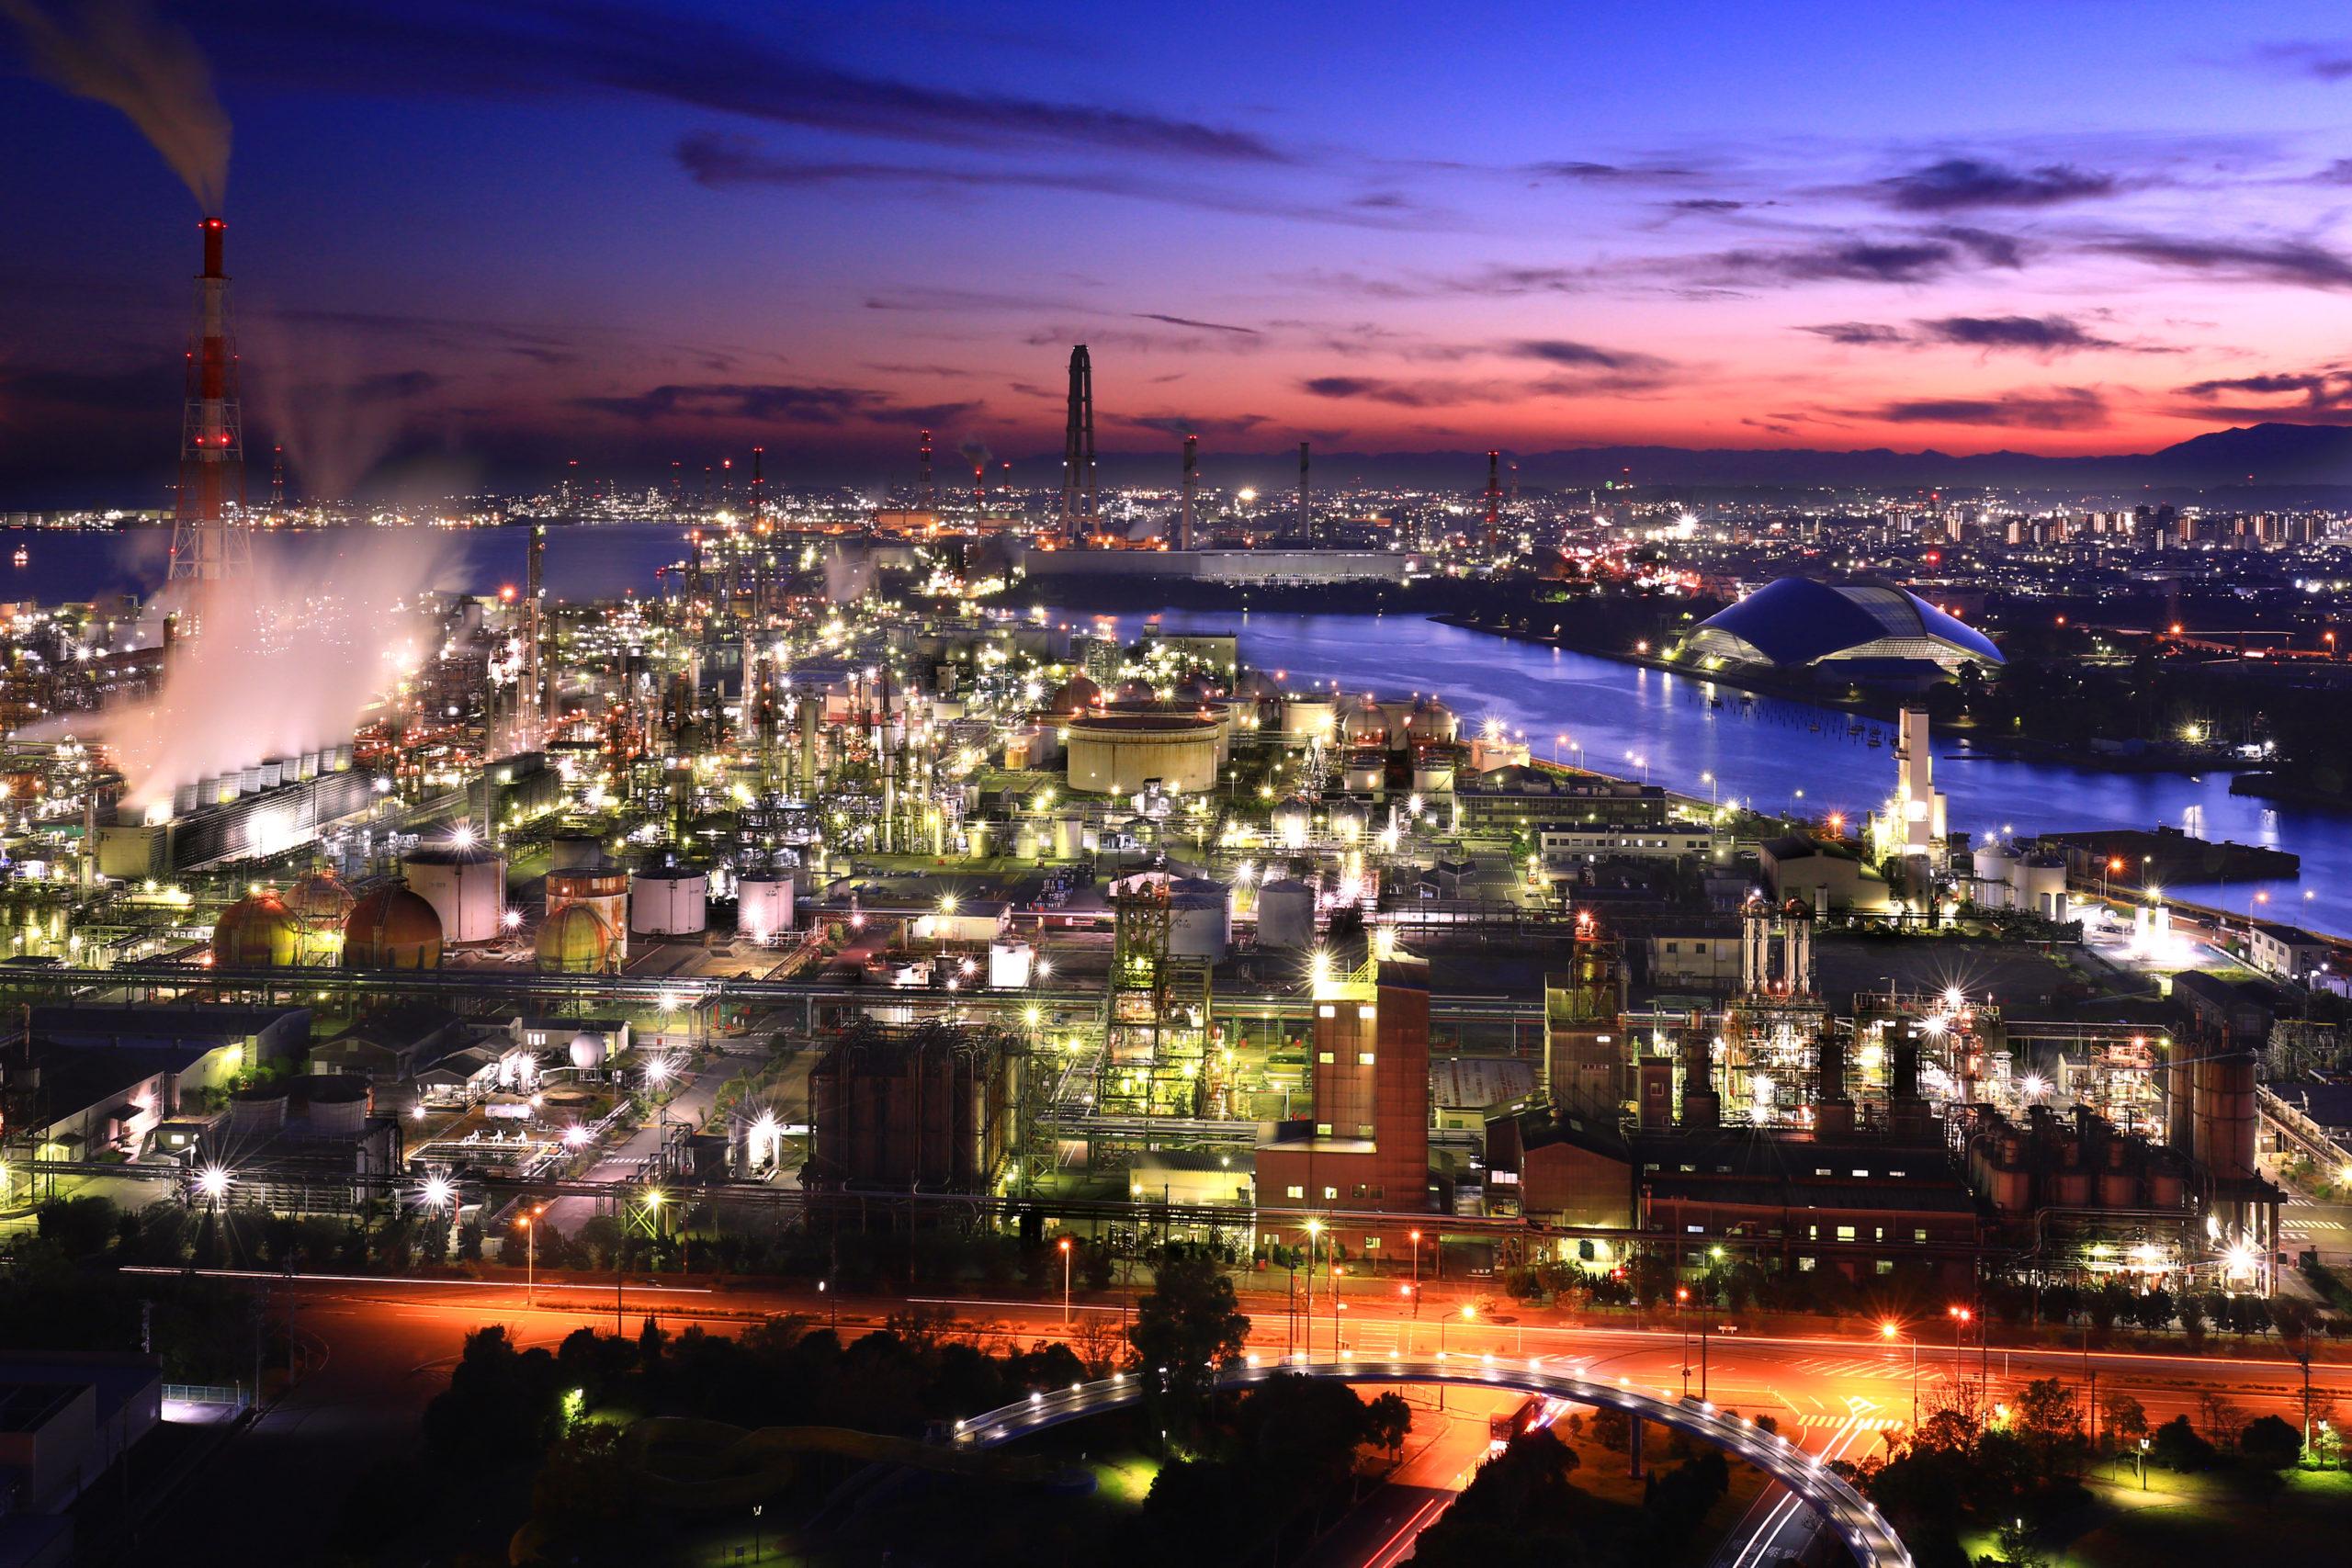 四日市港の夜景